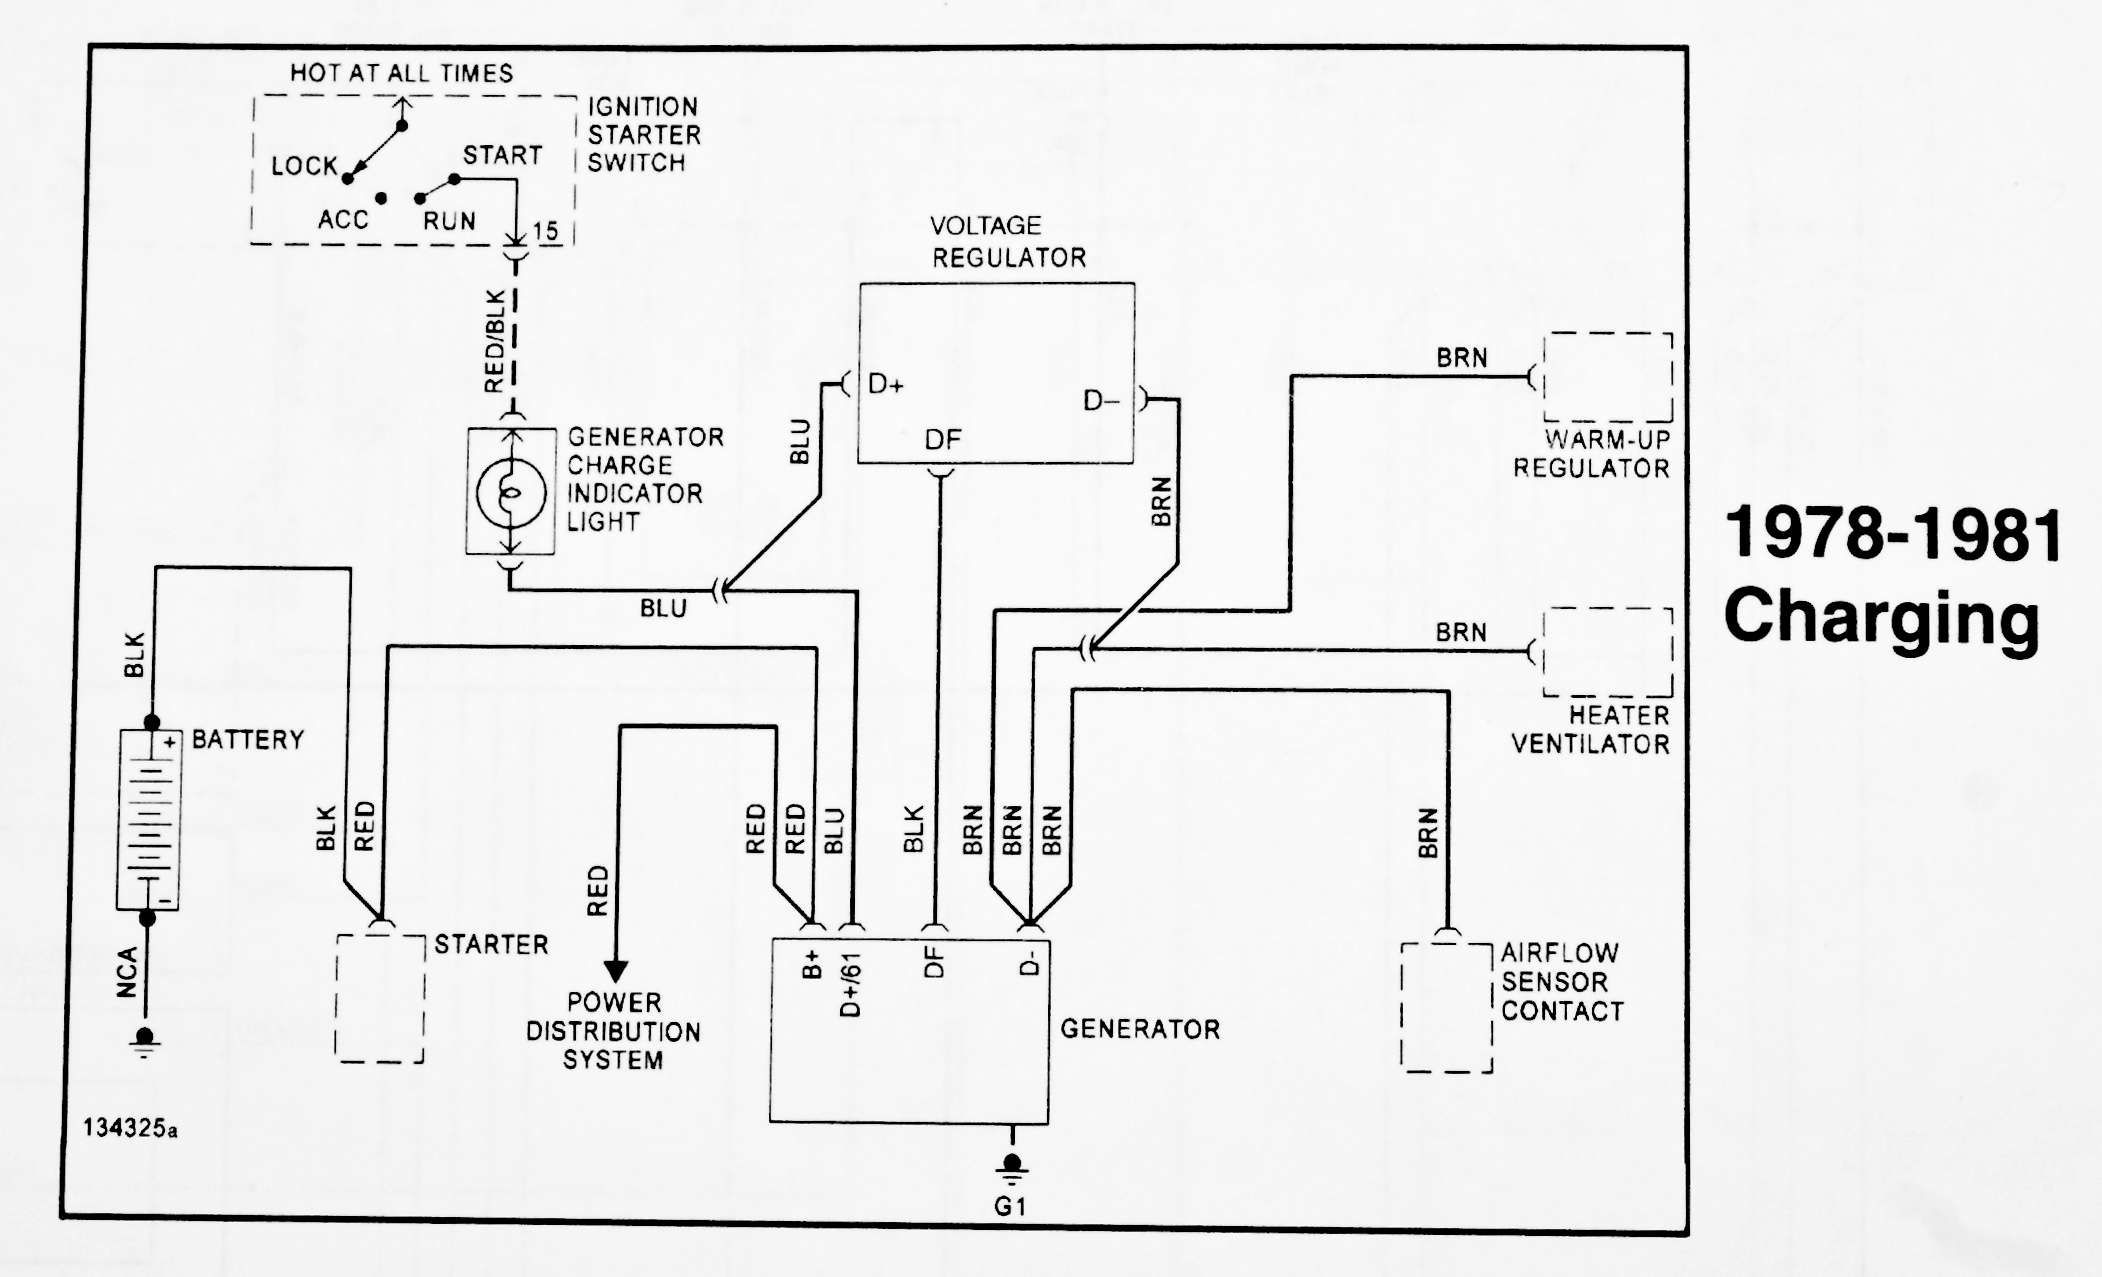 small resolution of porsche 911 starter wiring diagram detailed schematics diagram rh antonartgallery com porsche 944 turbo engine diagram